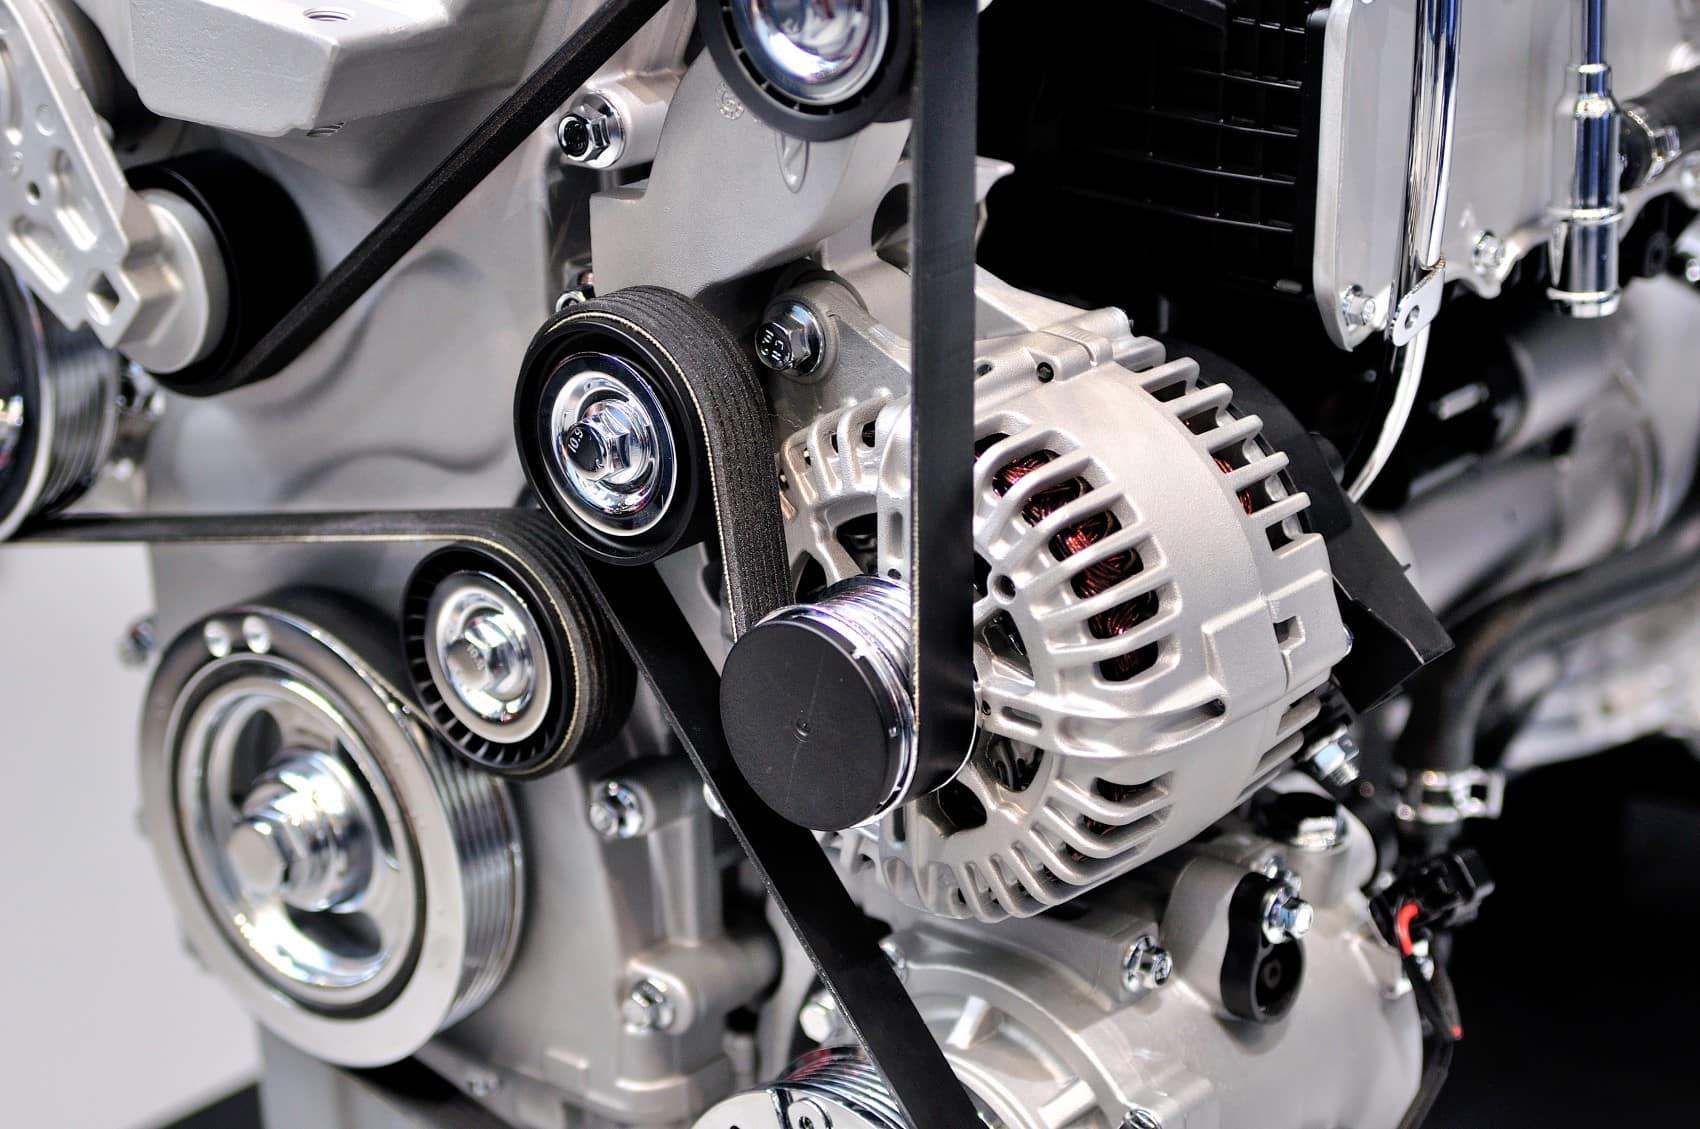 Drive belt inside engine